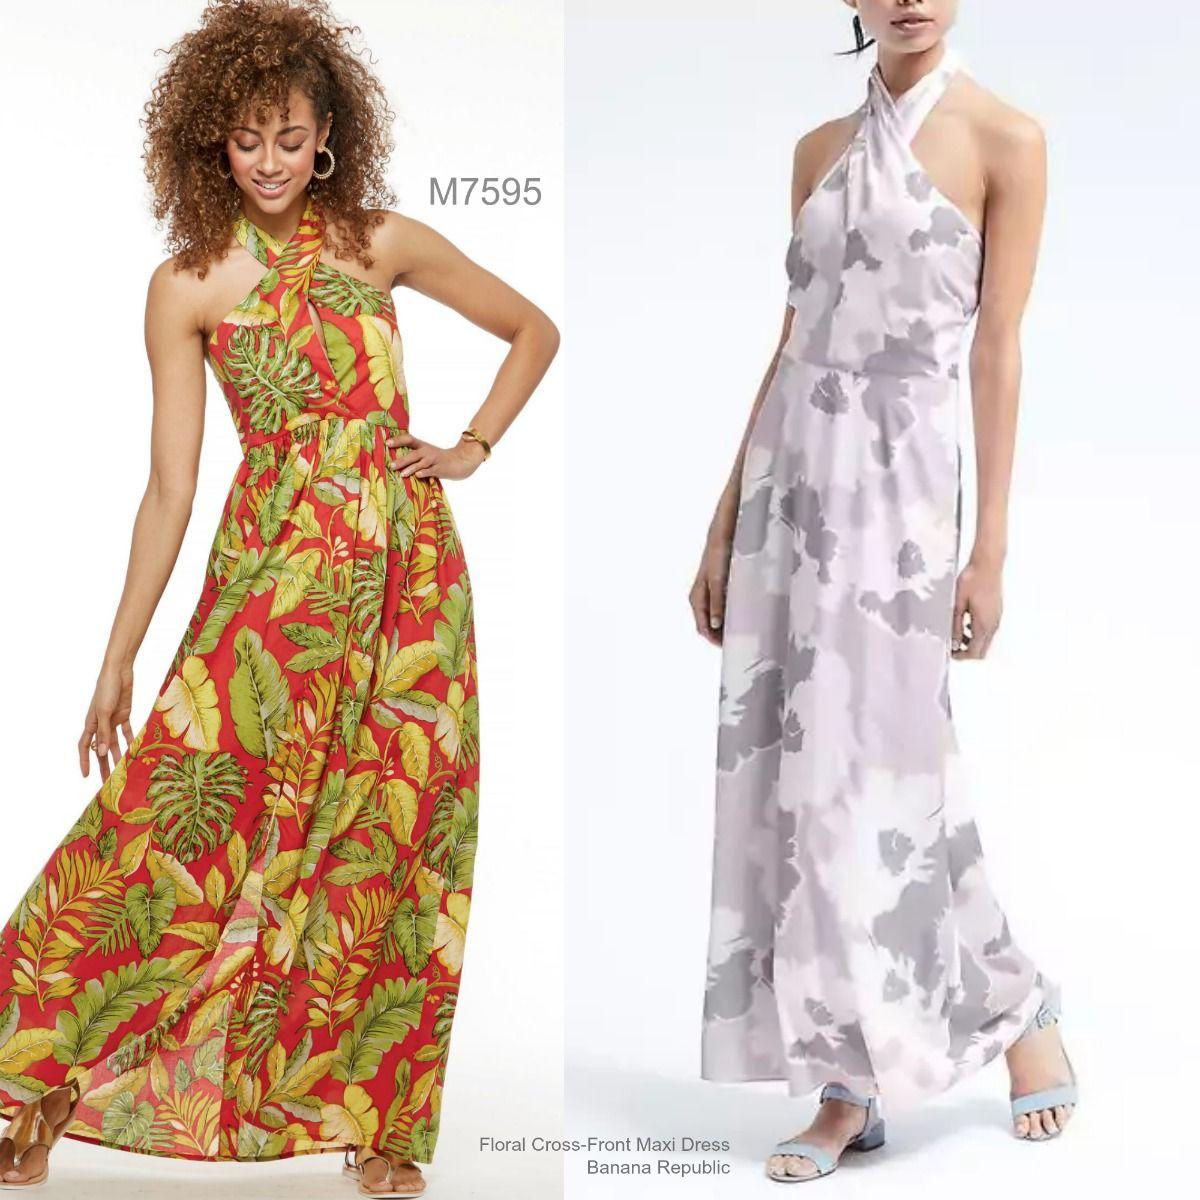 Sew The Look Mccall S M7595 Halter Cross Front Maxidress Sewing Pattern Beachy Dresses Diy Dress Dresses